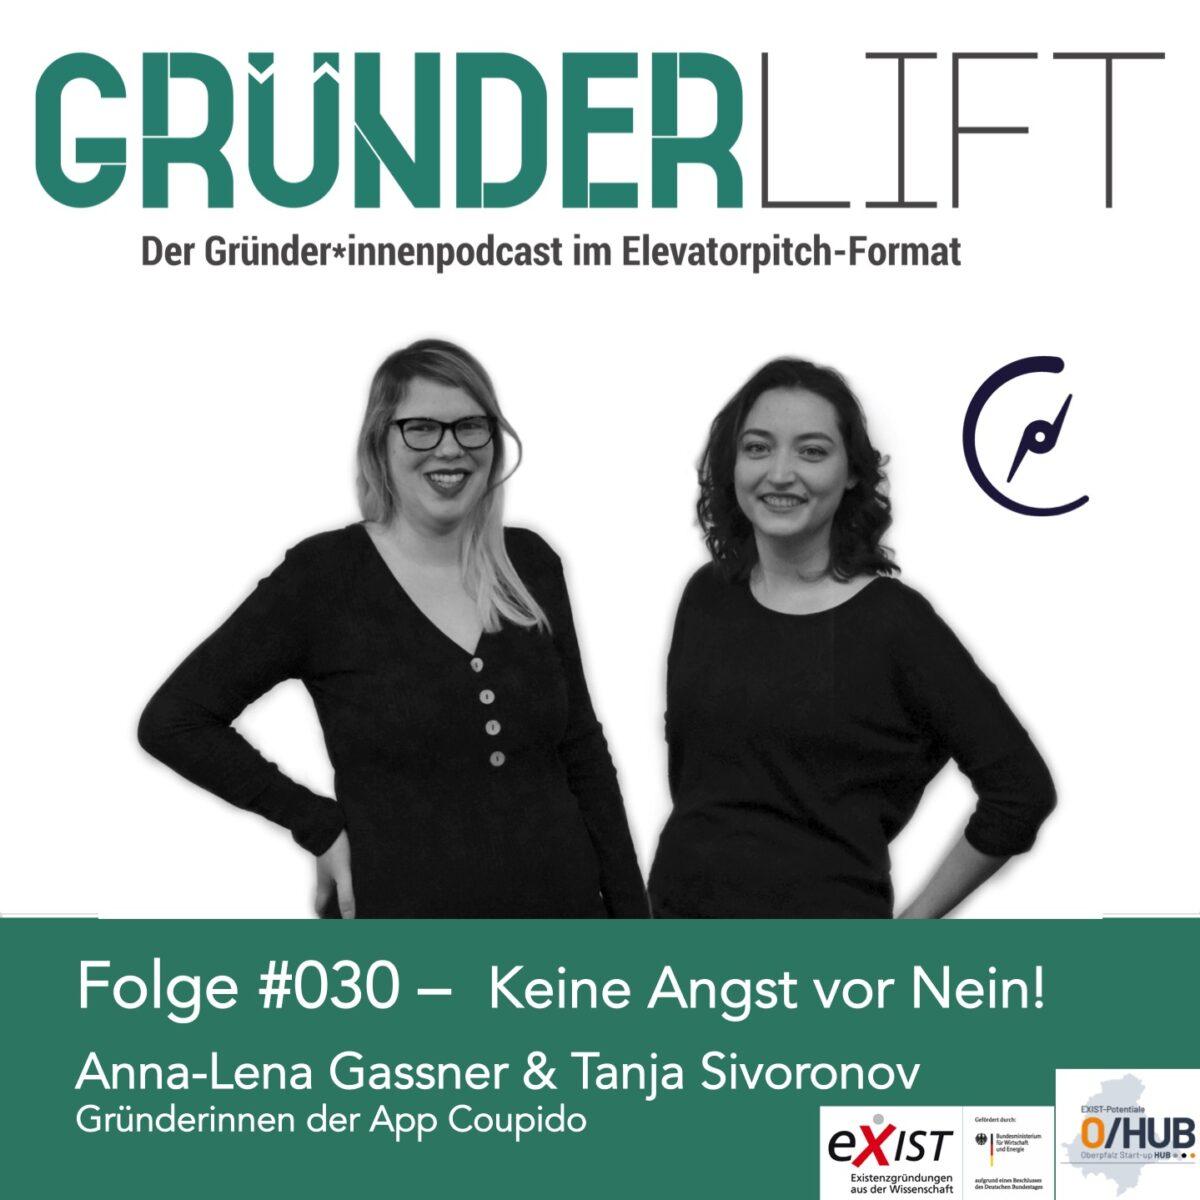 GründerLIFT Folge #030Tanja Sivoronov und Anna-Lena Gassner